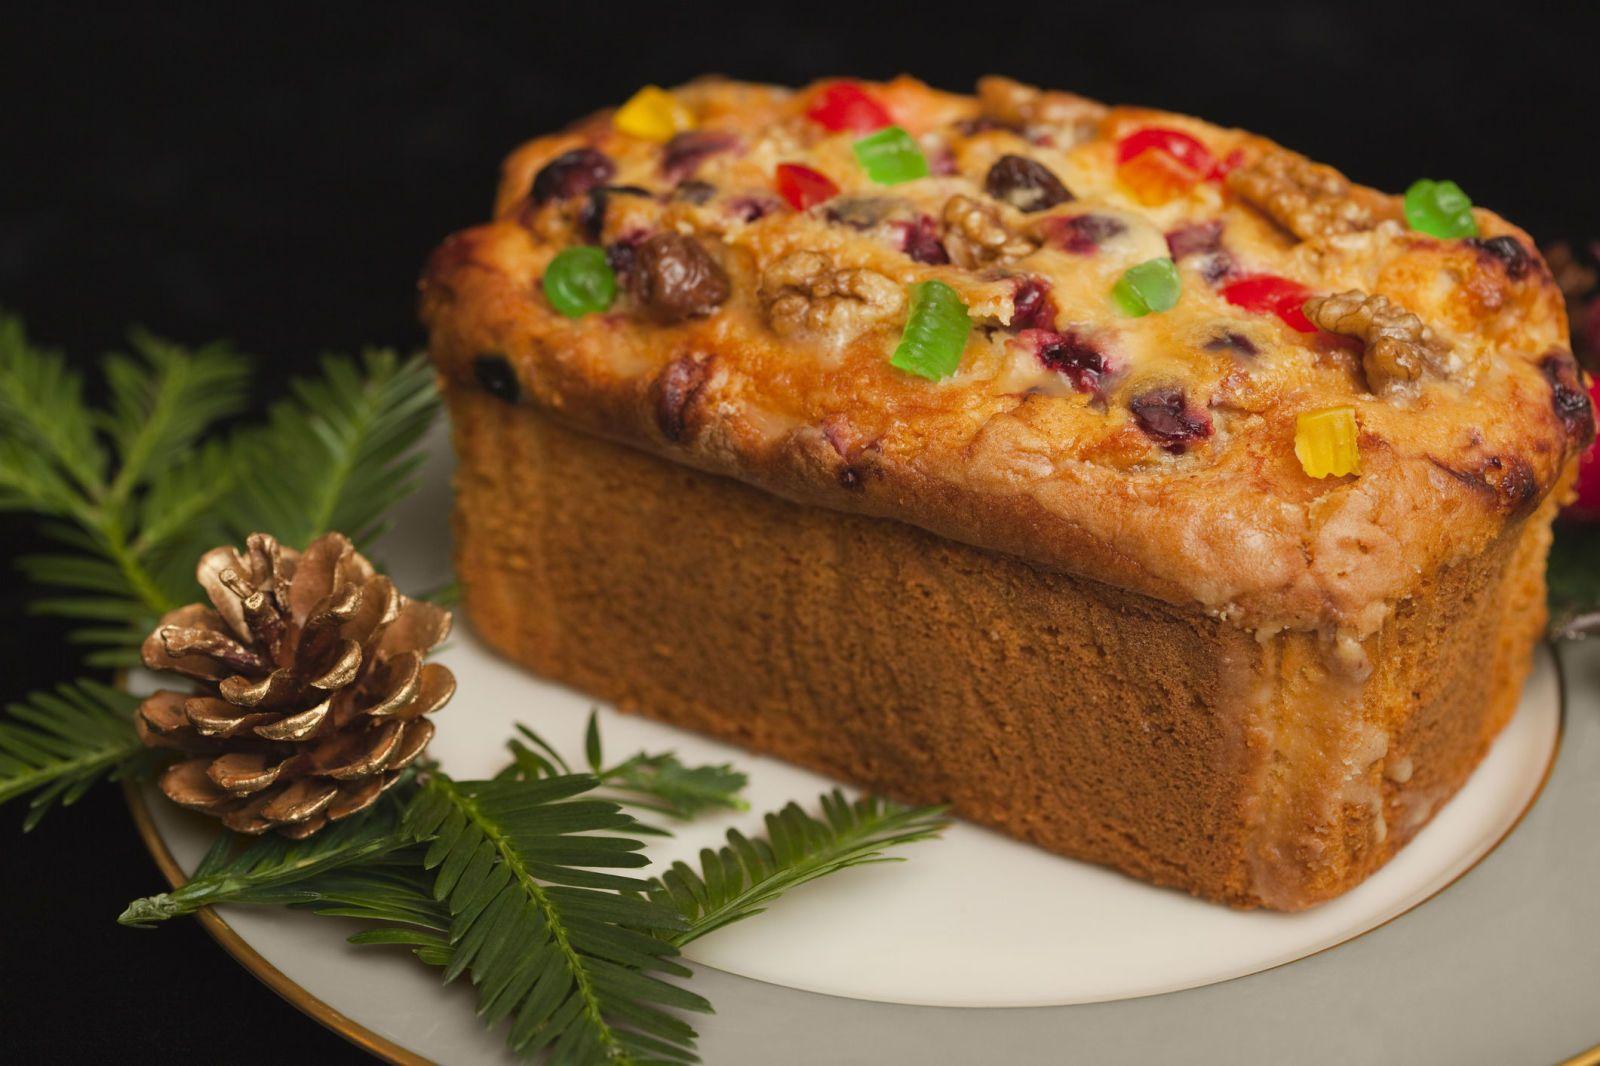 7 Reasons You Should Never Eat Fruitcake